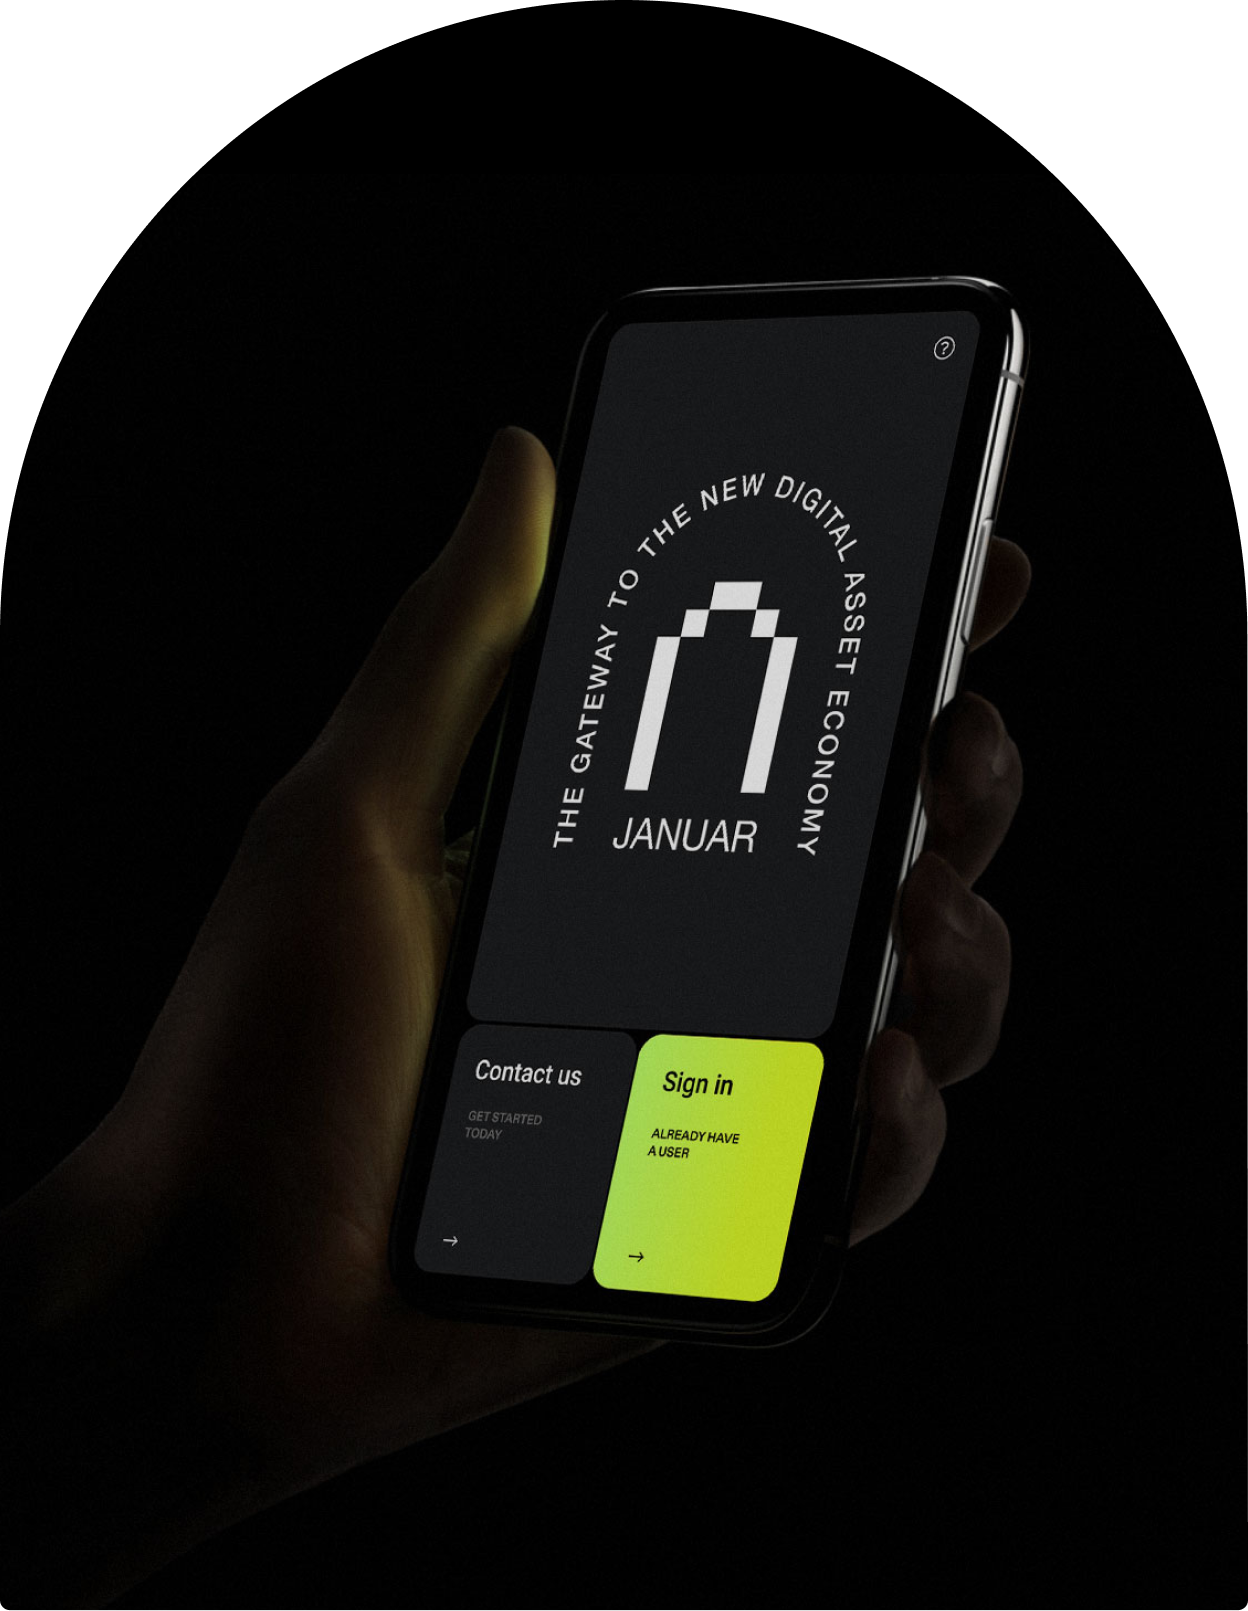 Januar user interface on mobile